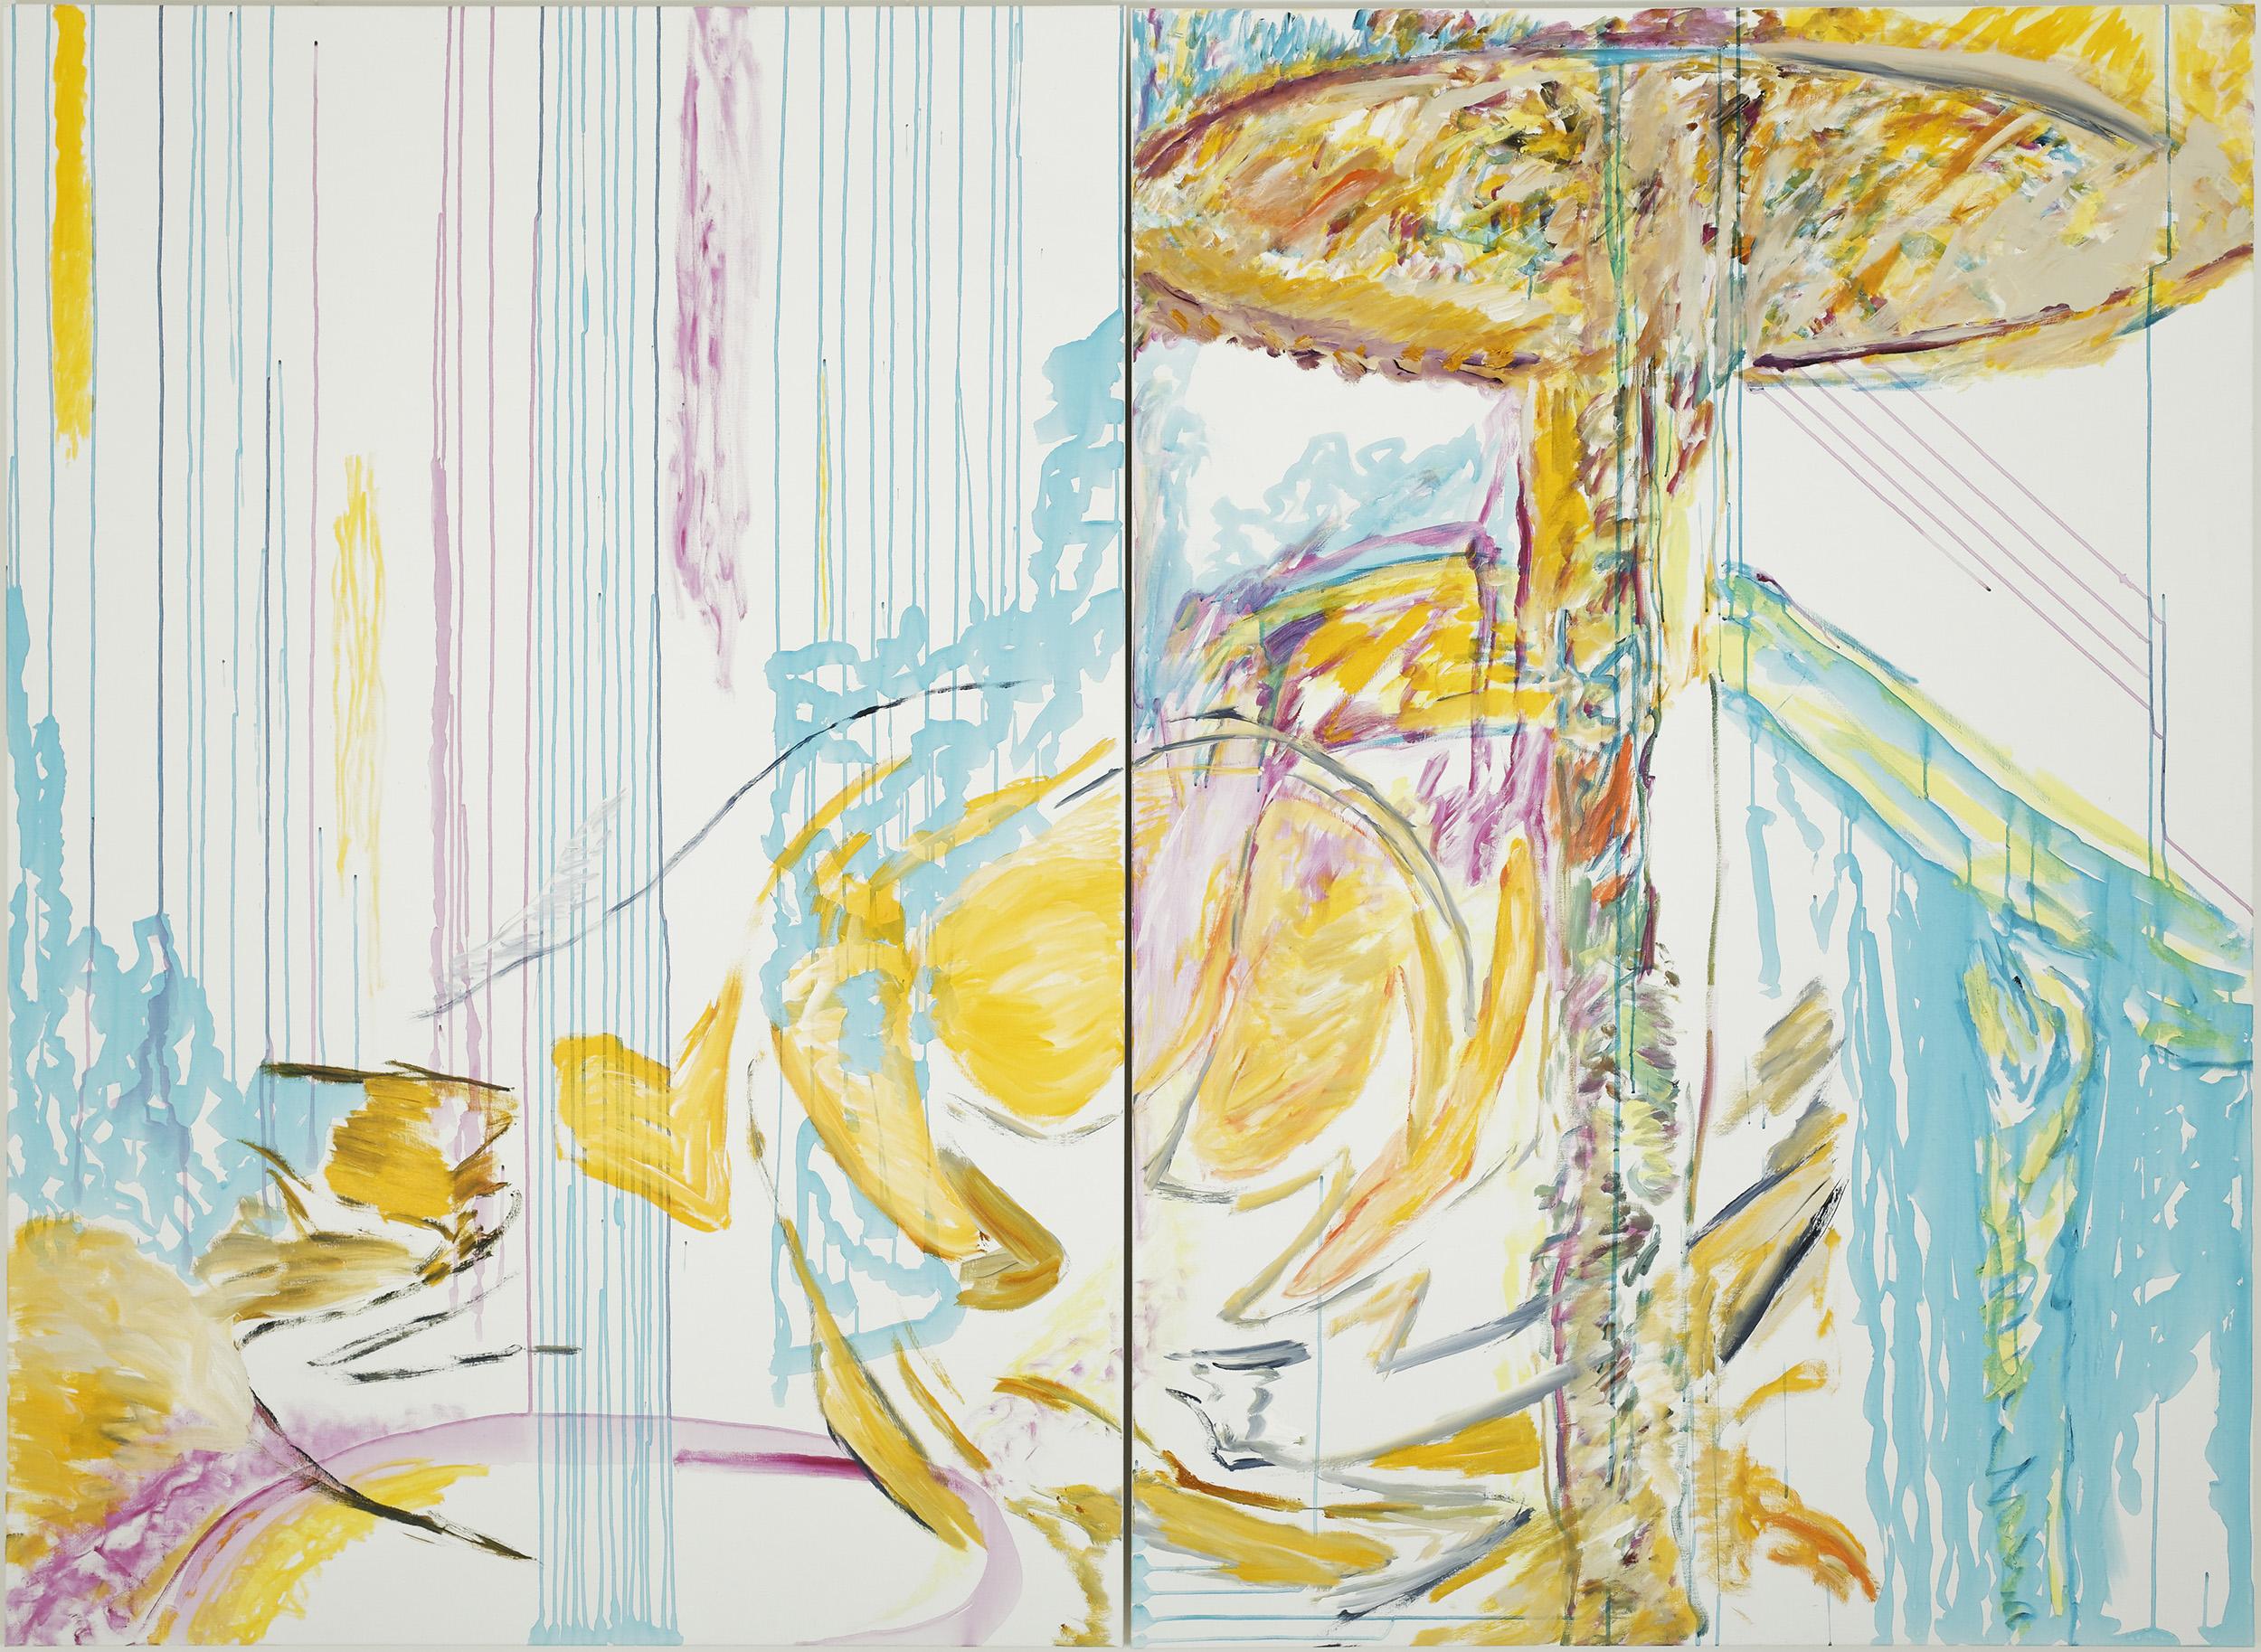 Up&Down (acrylic on canvas, 130 x 190 cm x 2 - 2018)